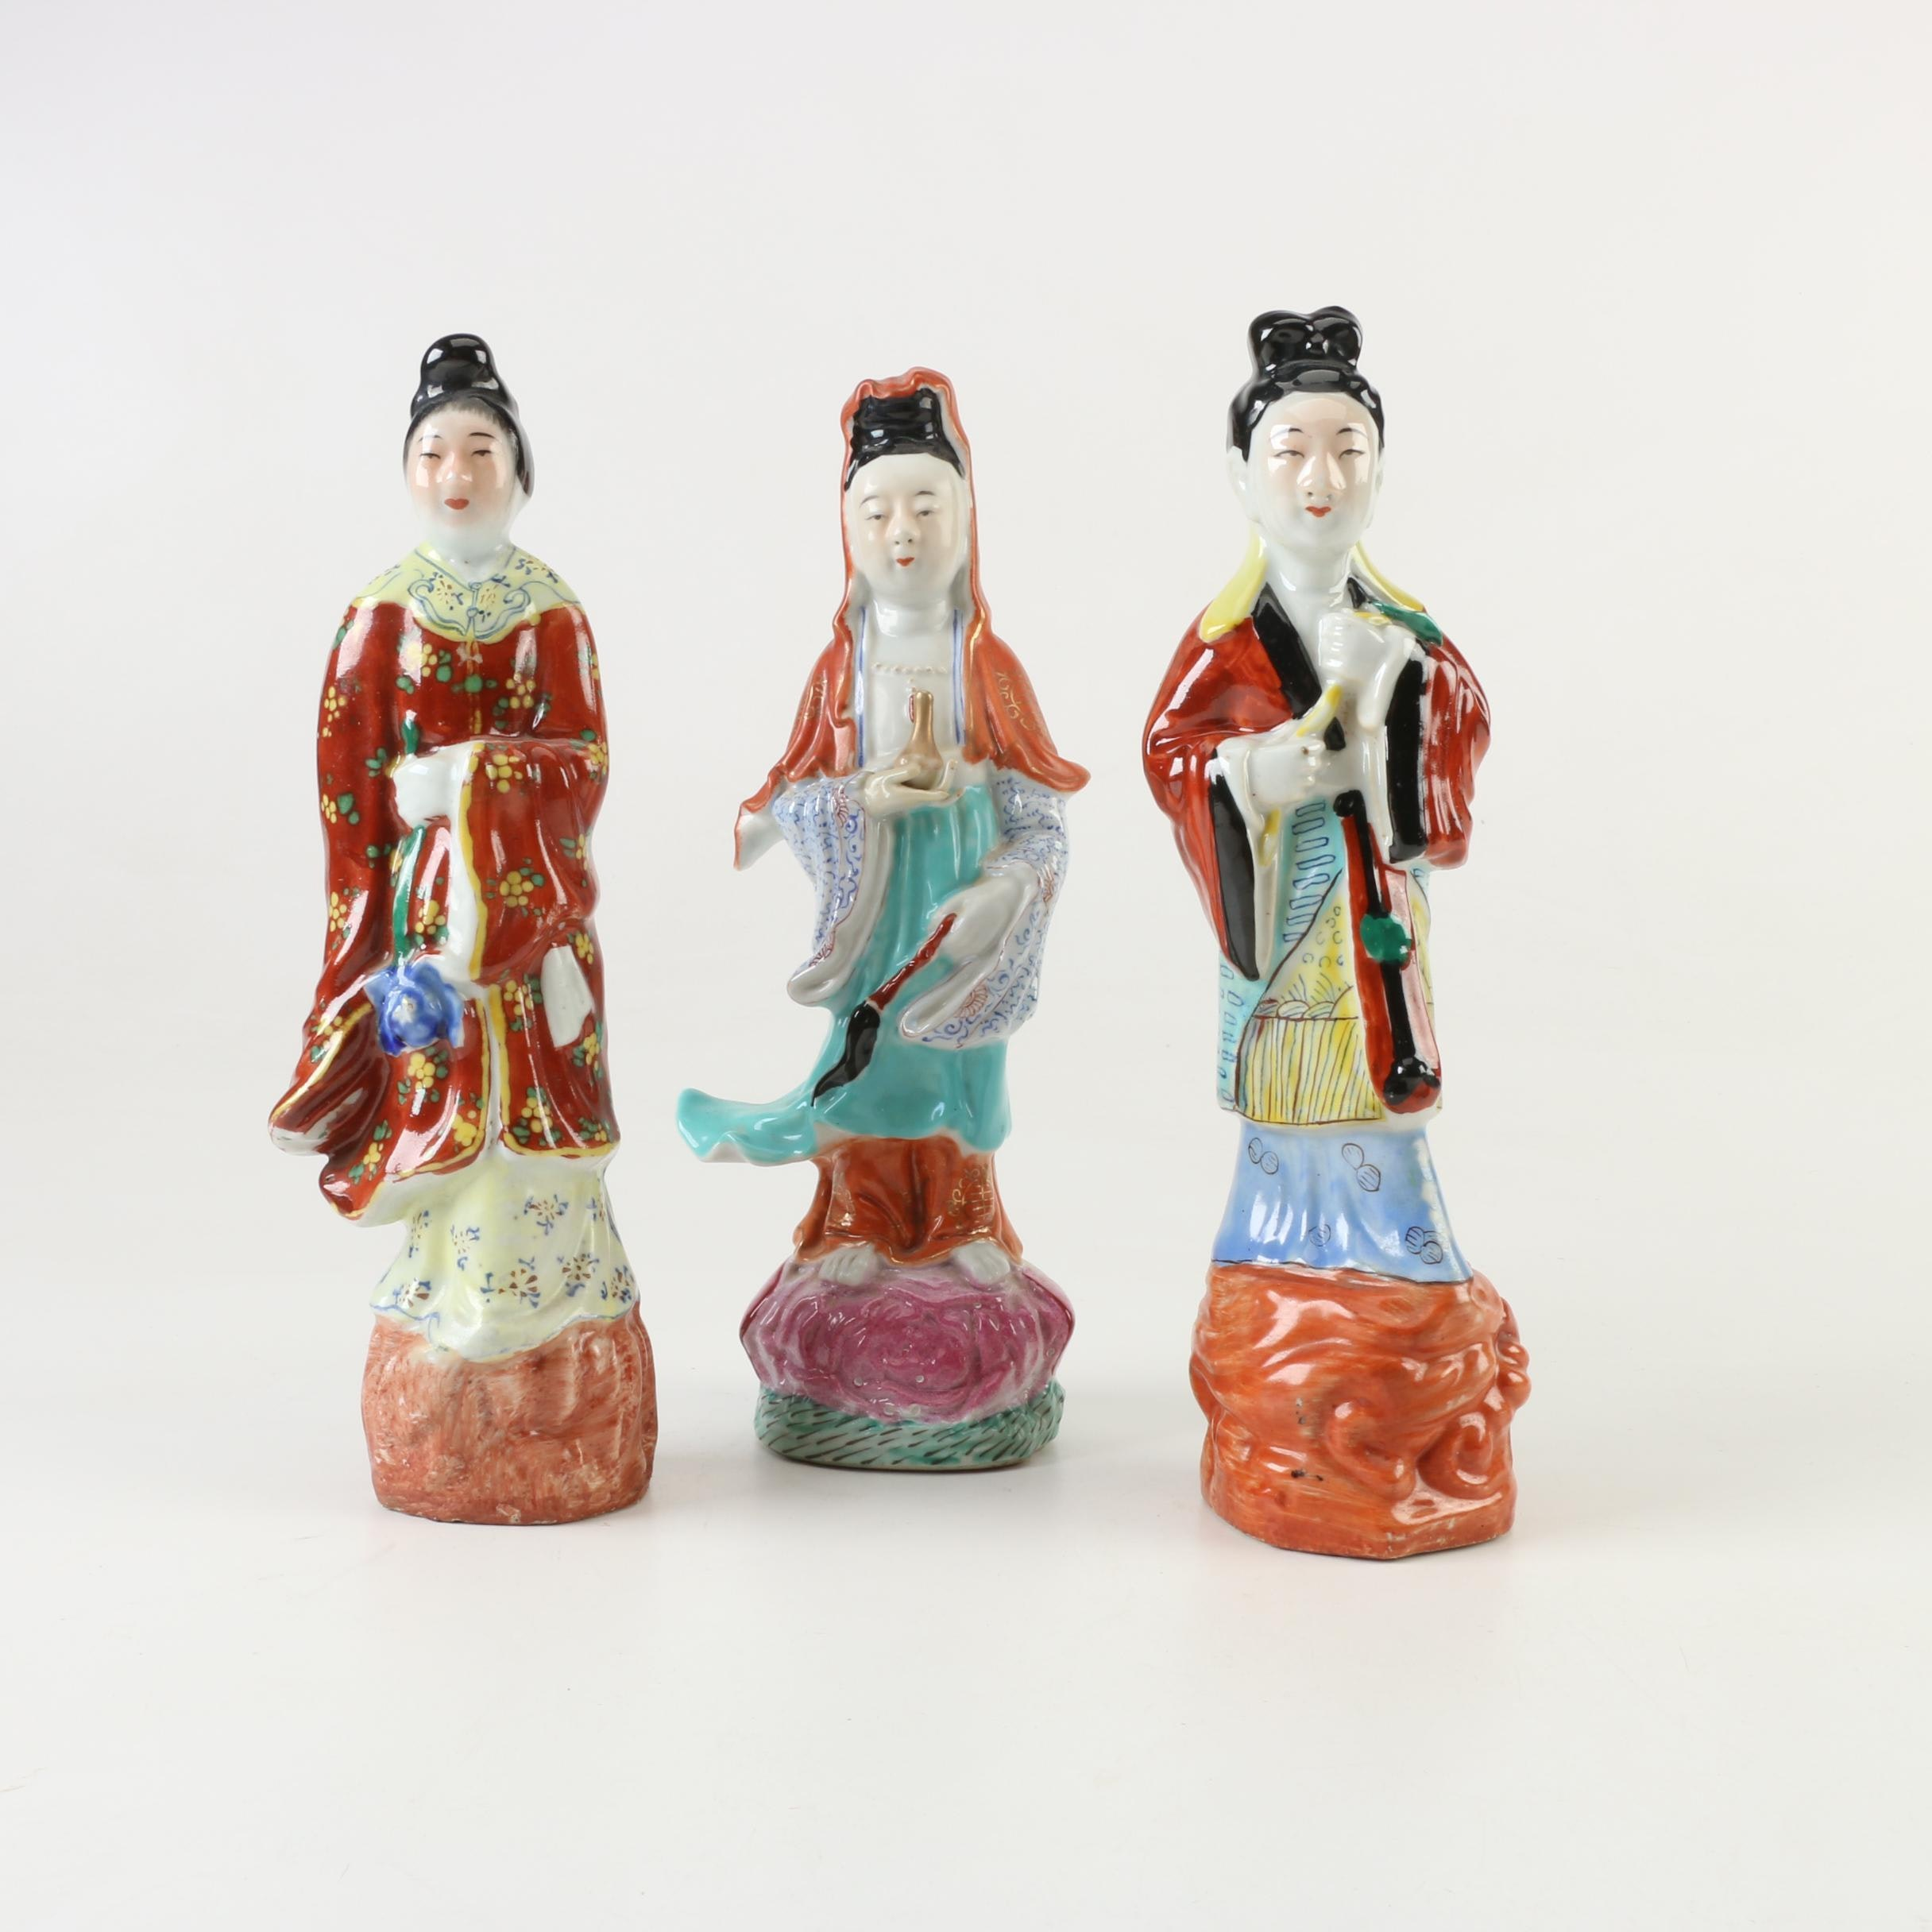 Chinese Hand-Painted Ceramic Figurines